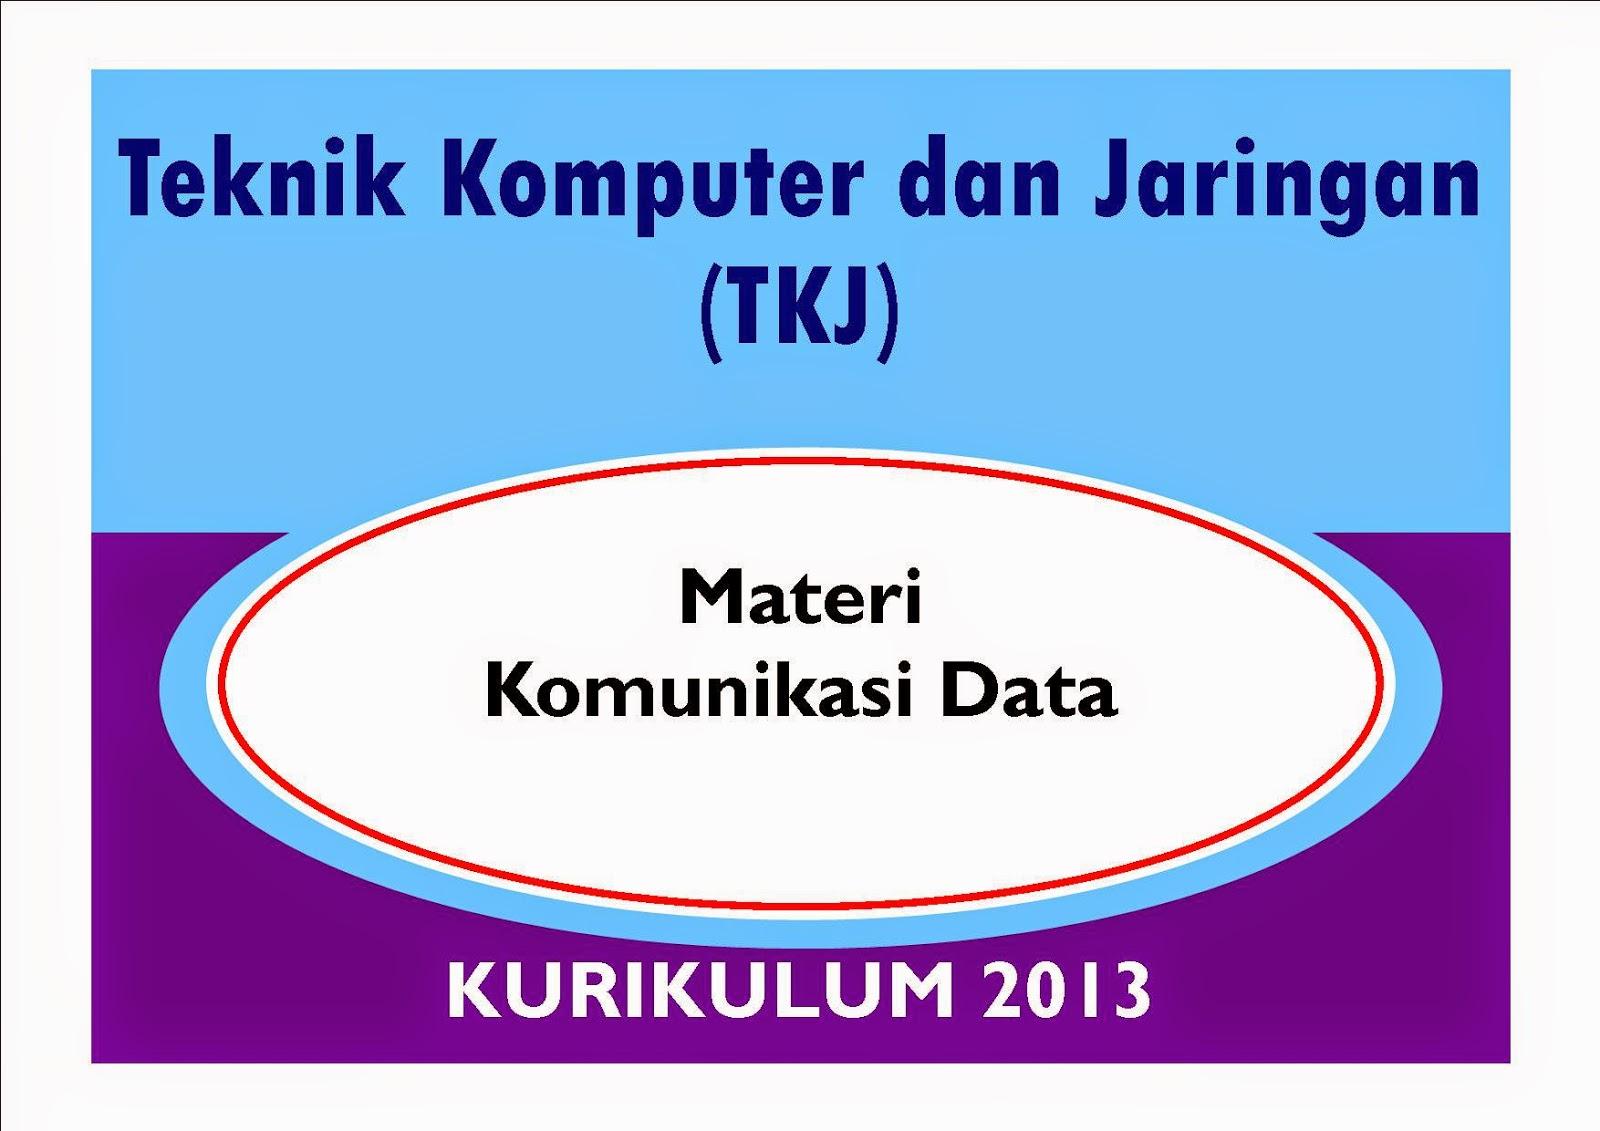 Materi Komunikasi Data TKJ Kurikulum 2013